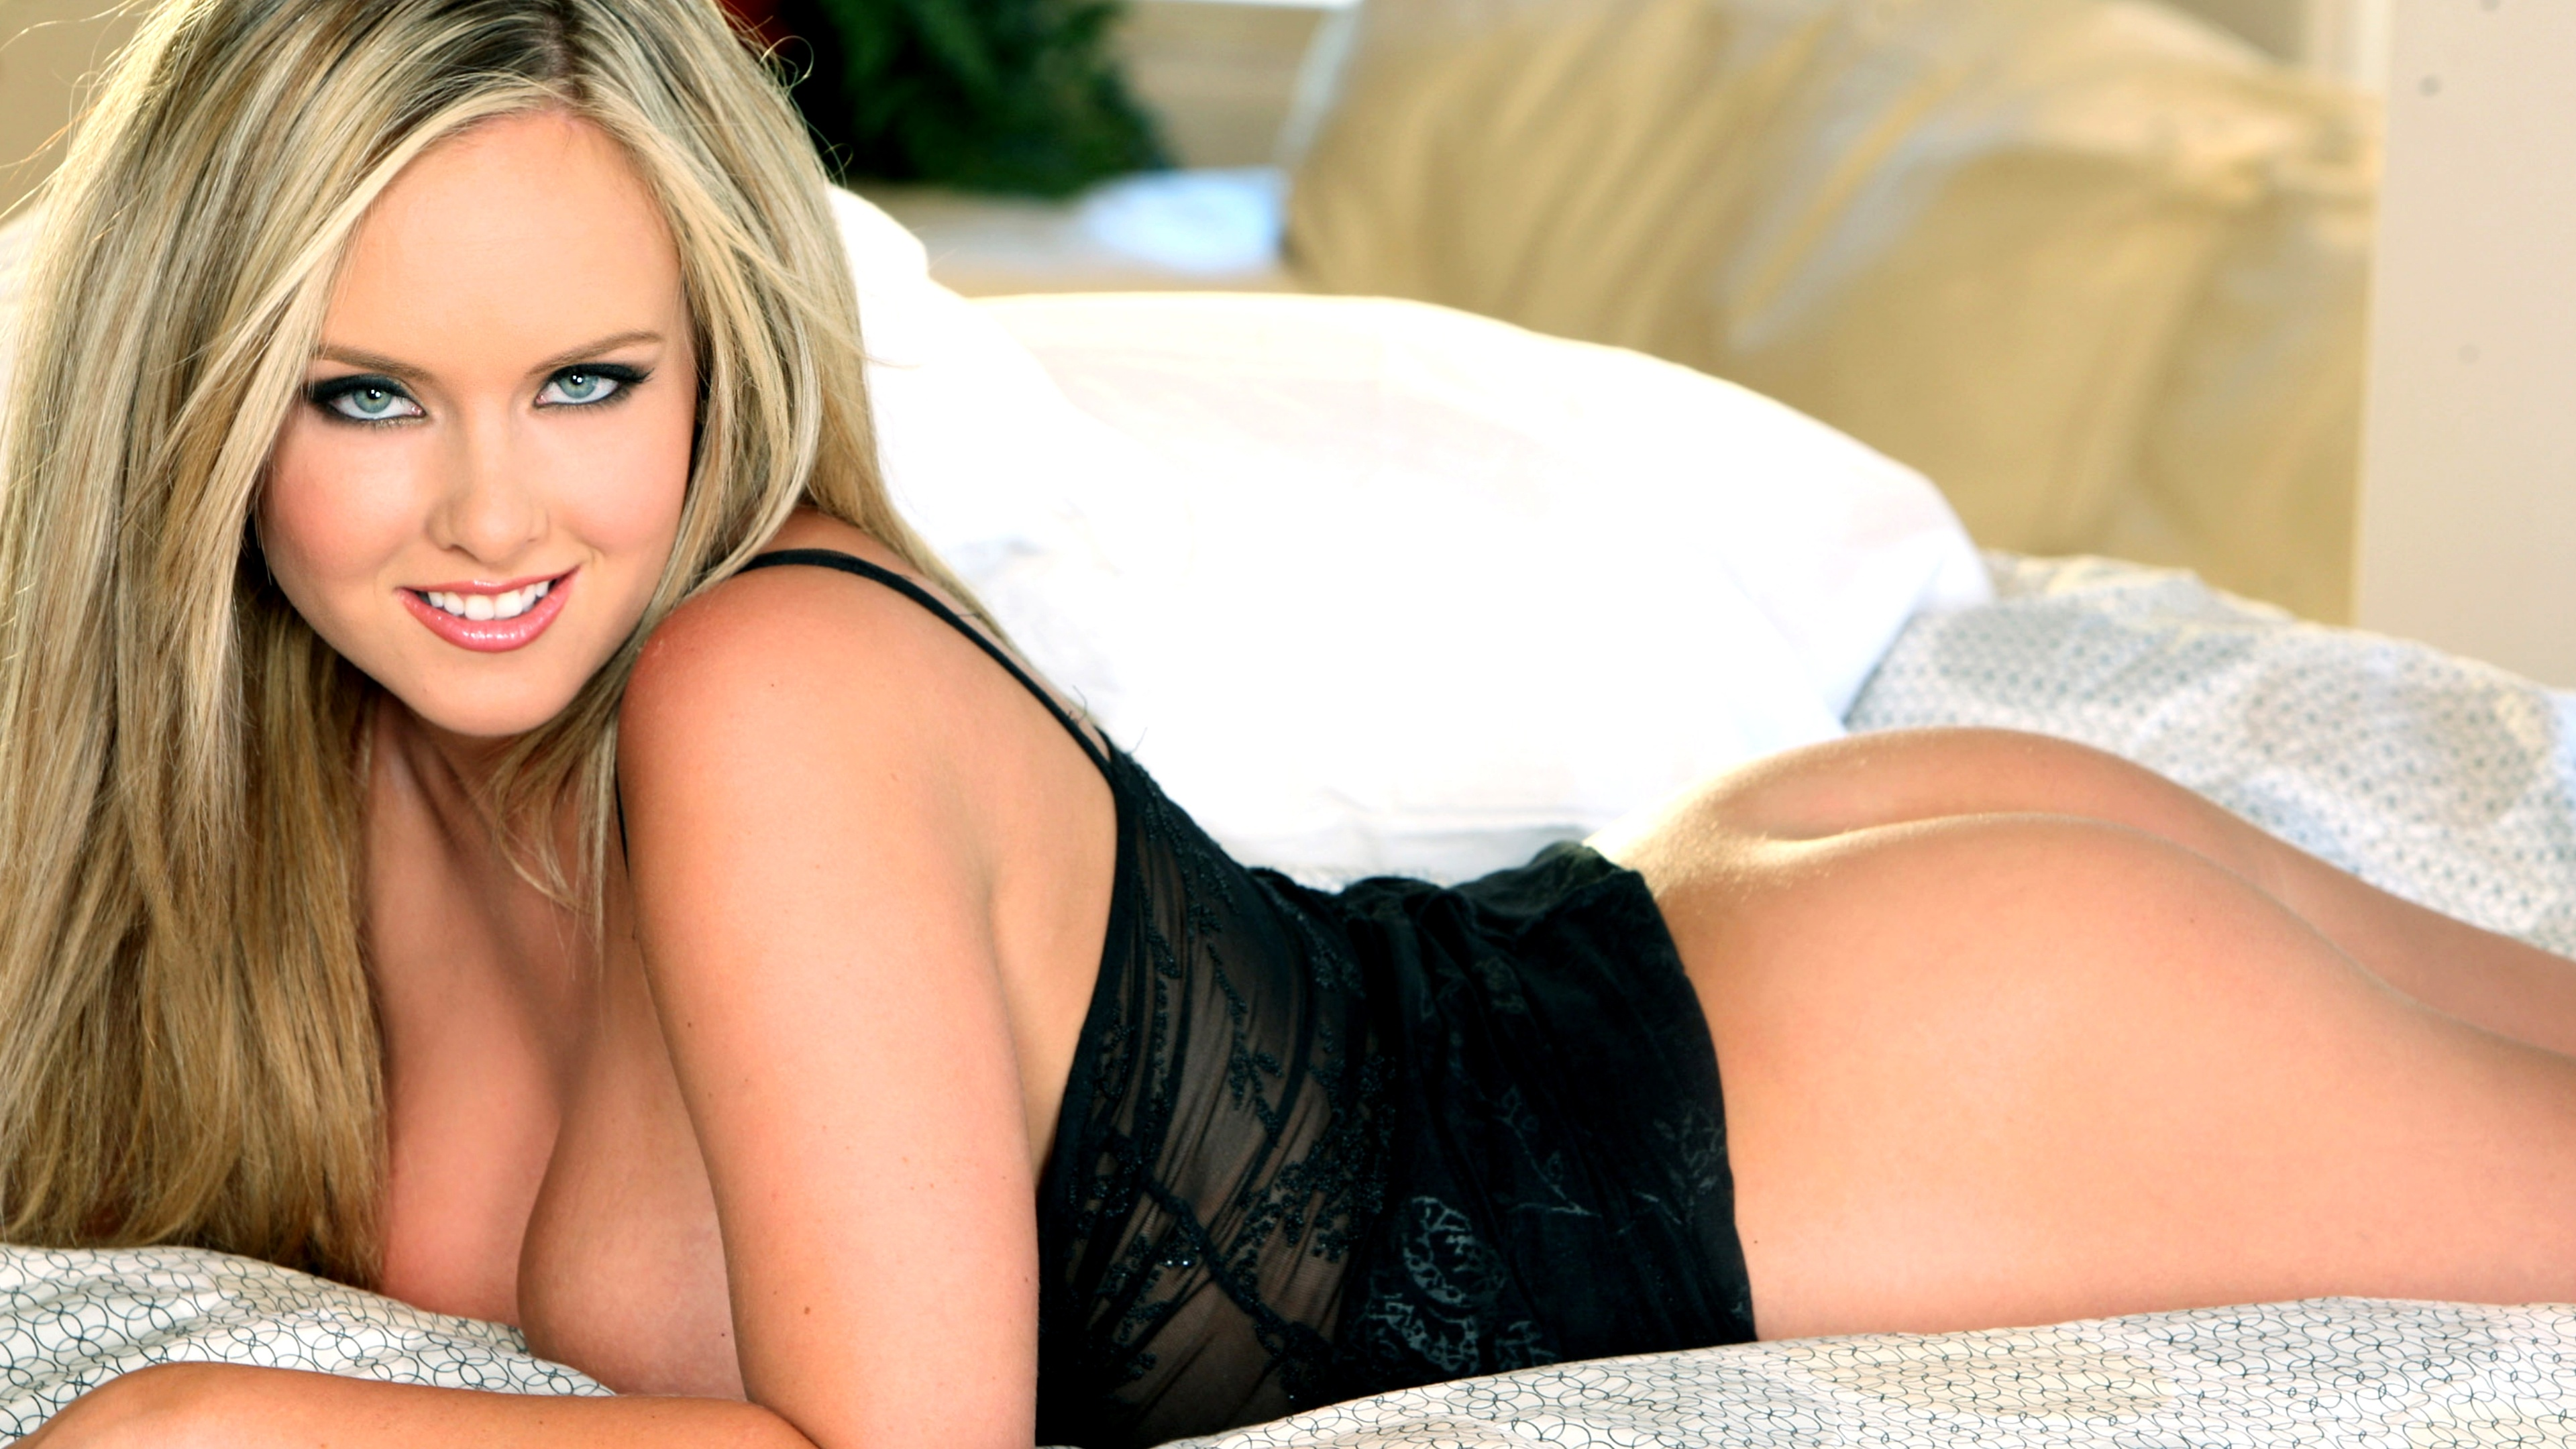 Wallpaper Brittanys Bod, Model, Amazing, Blonde, Big Boobs -5154